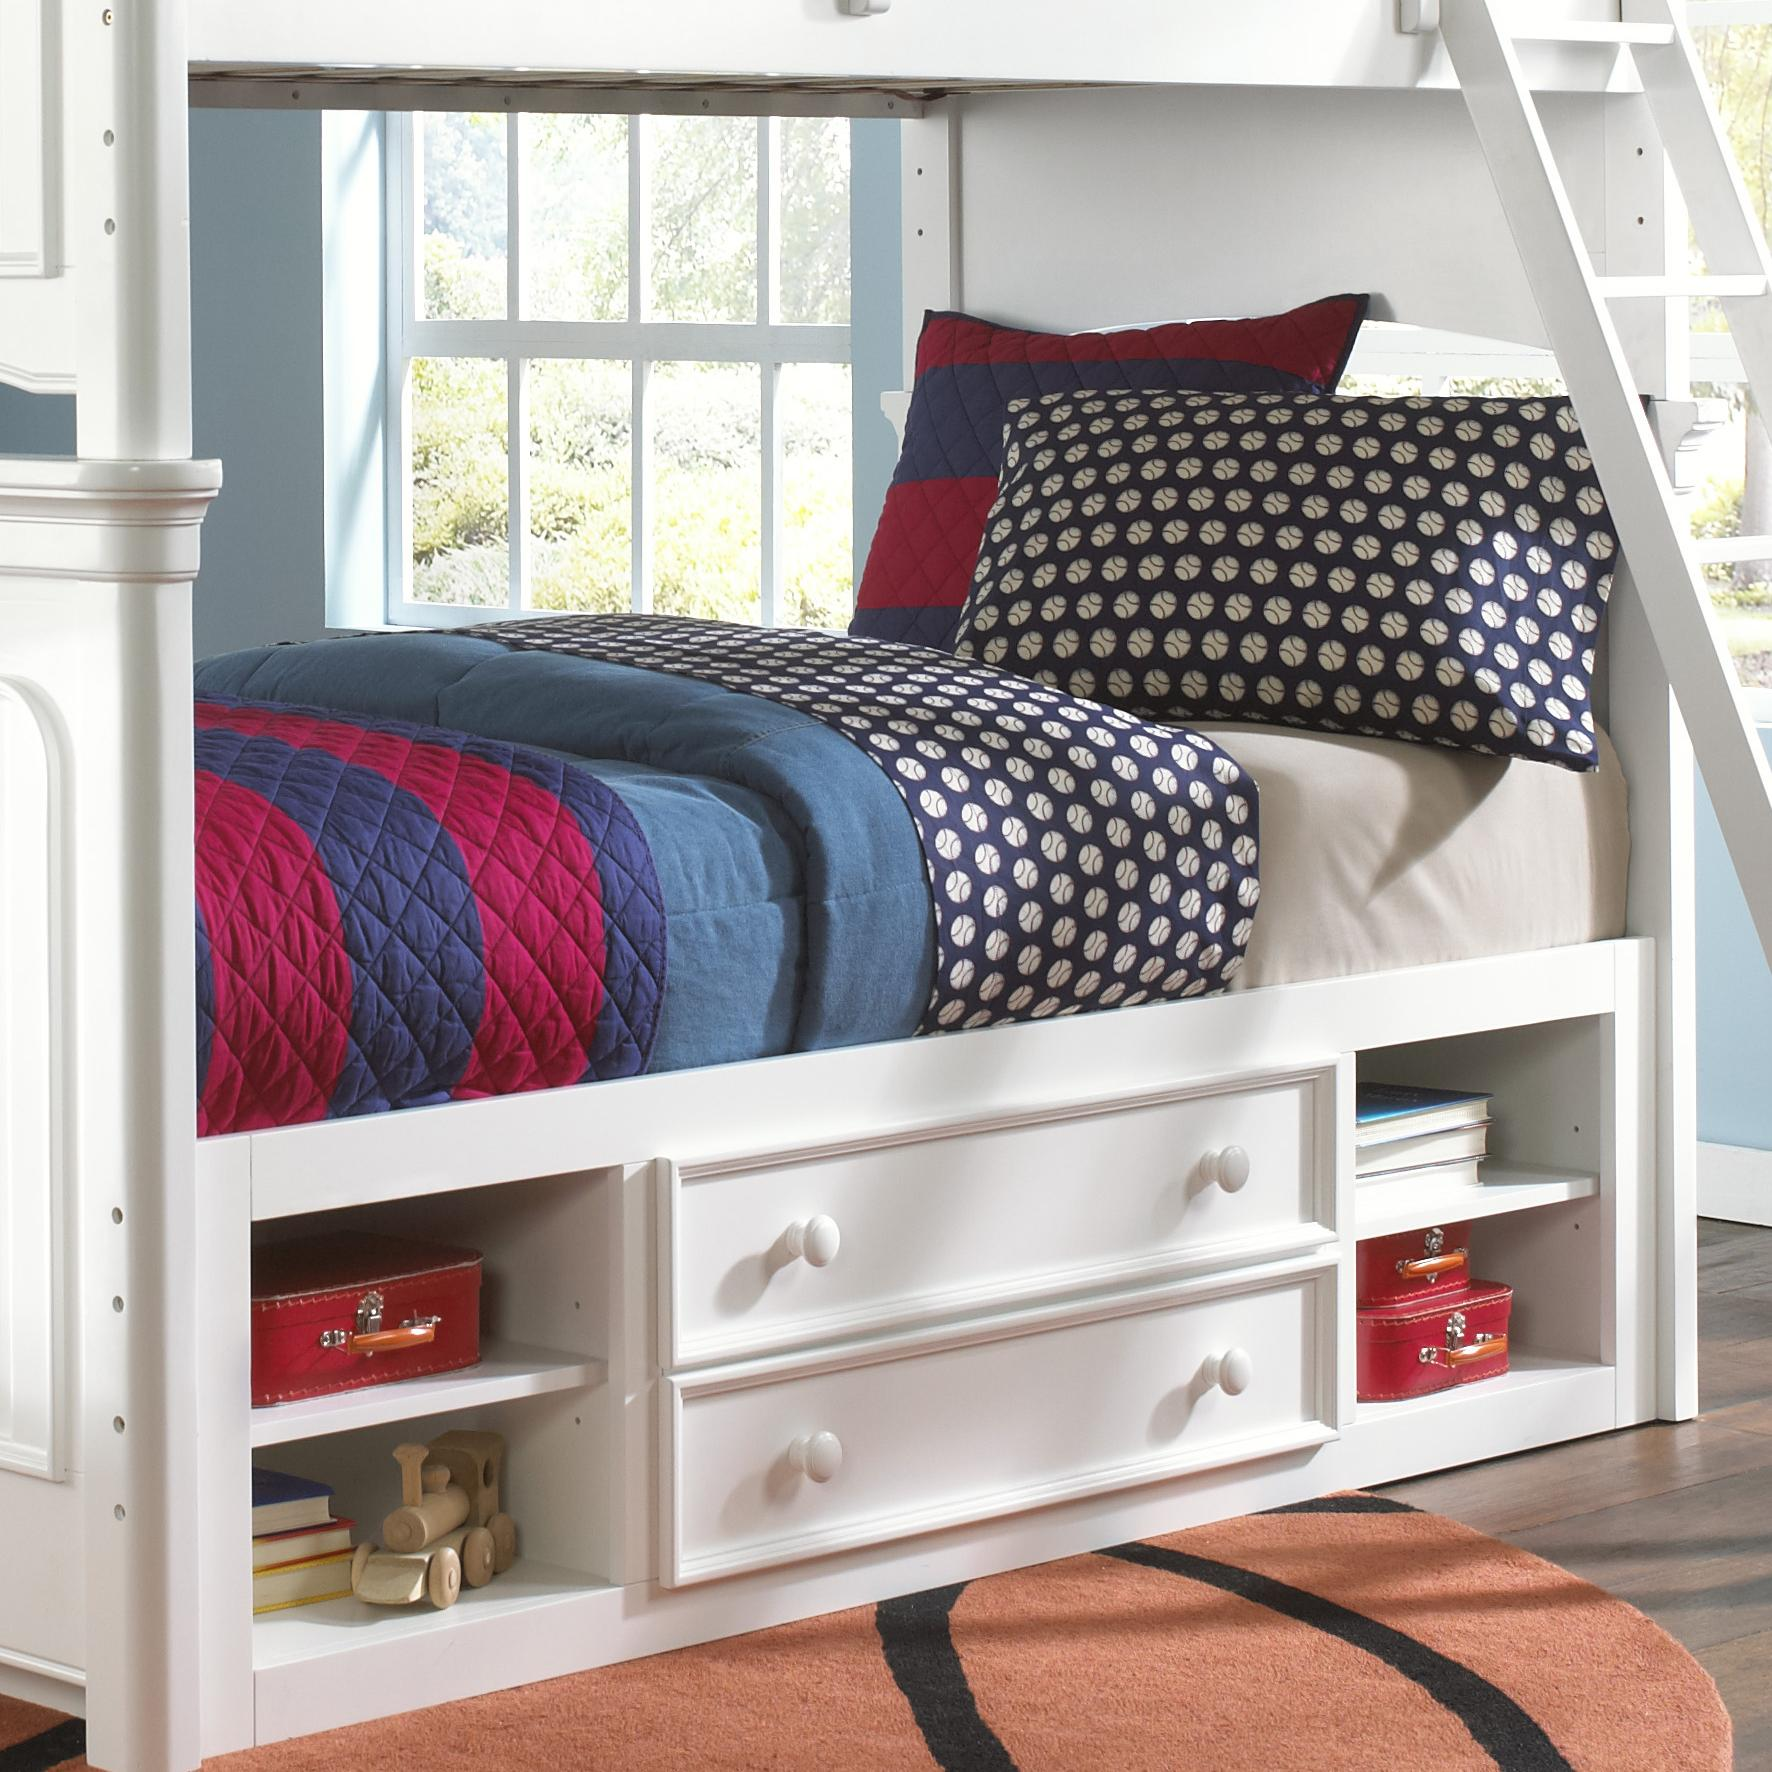 Kidz Gear Campbell Summertime Twin Storage Bunk Bed - Item Number: 8466-730+732+SLATR-33+731+643